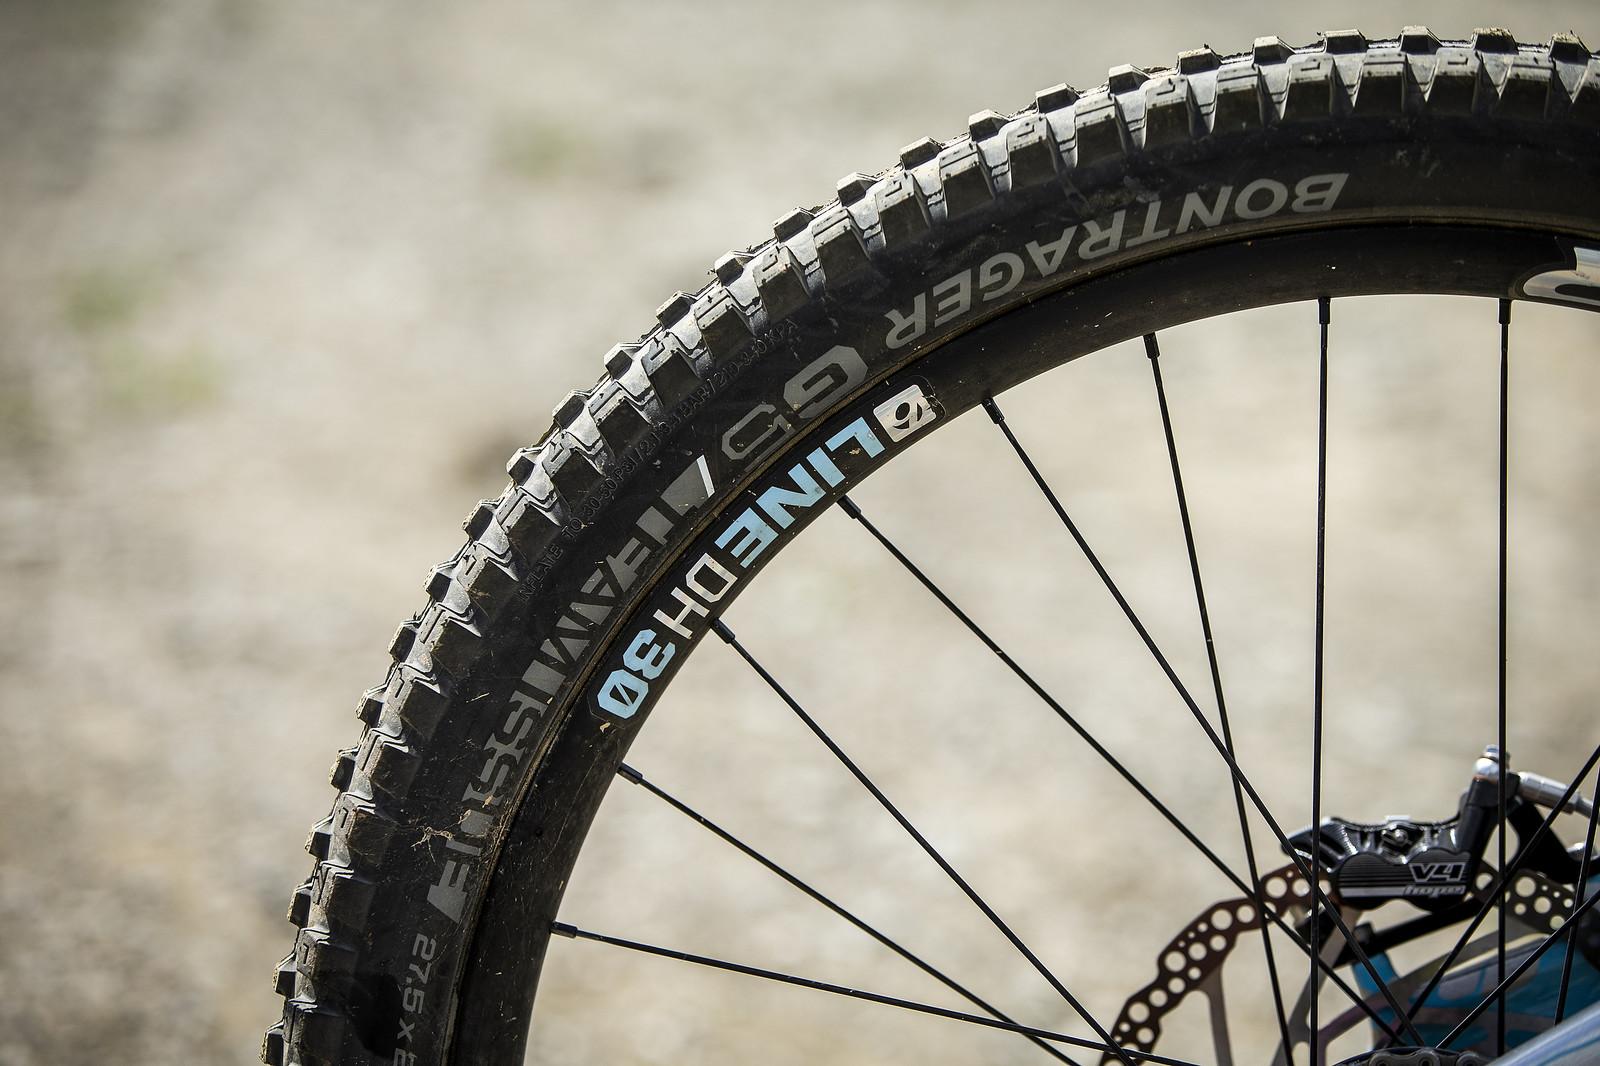 Bontrager G5 Team Issue Tires - WINNING BIKE - Rachel Atherton's Trek Session - Mountain Biking Pictures - Vital MTB